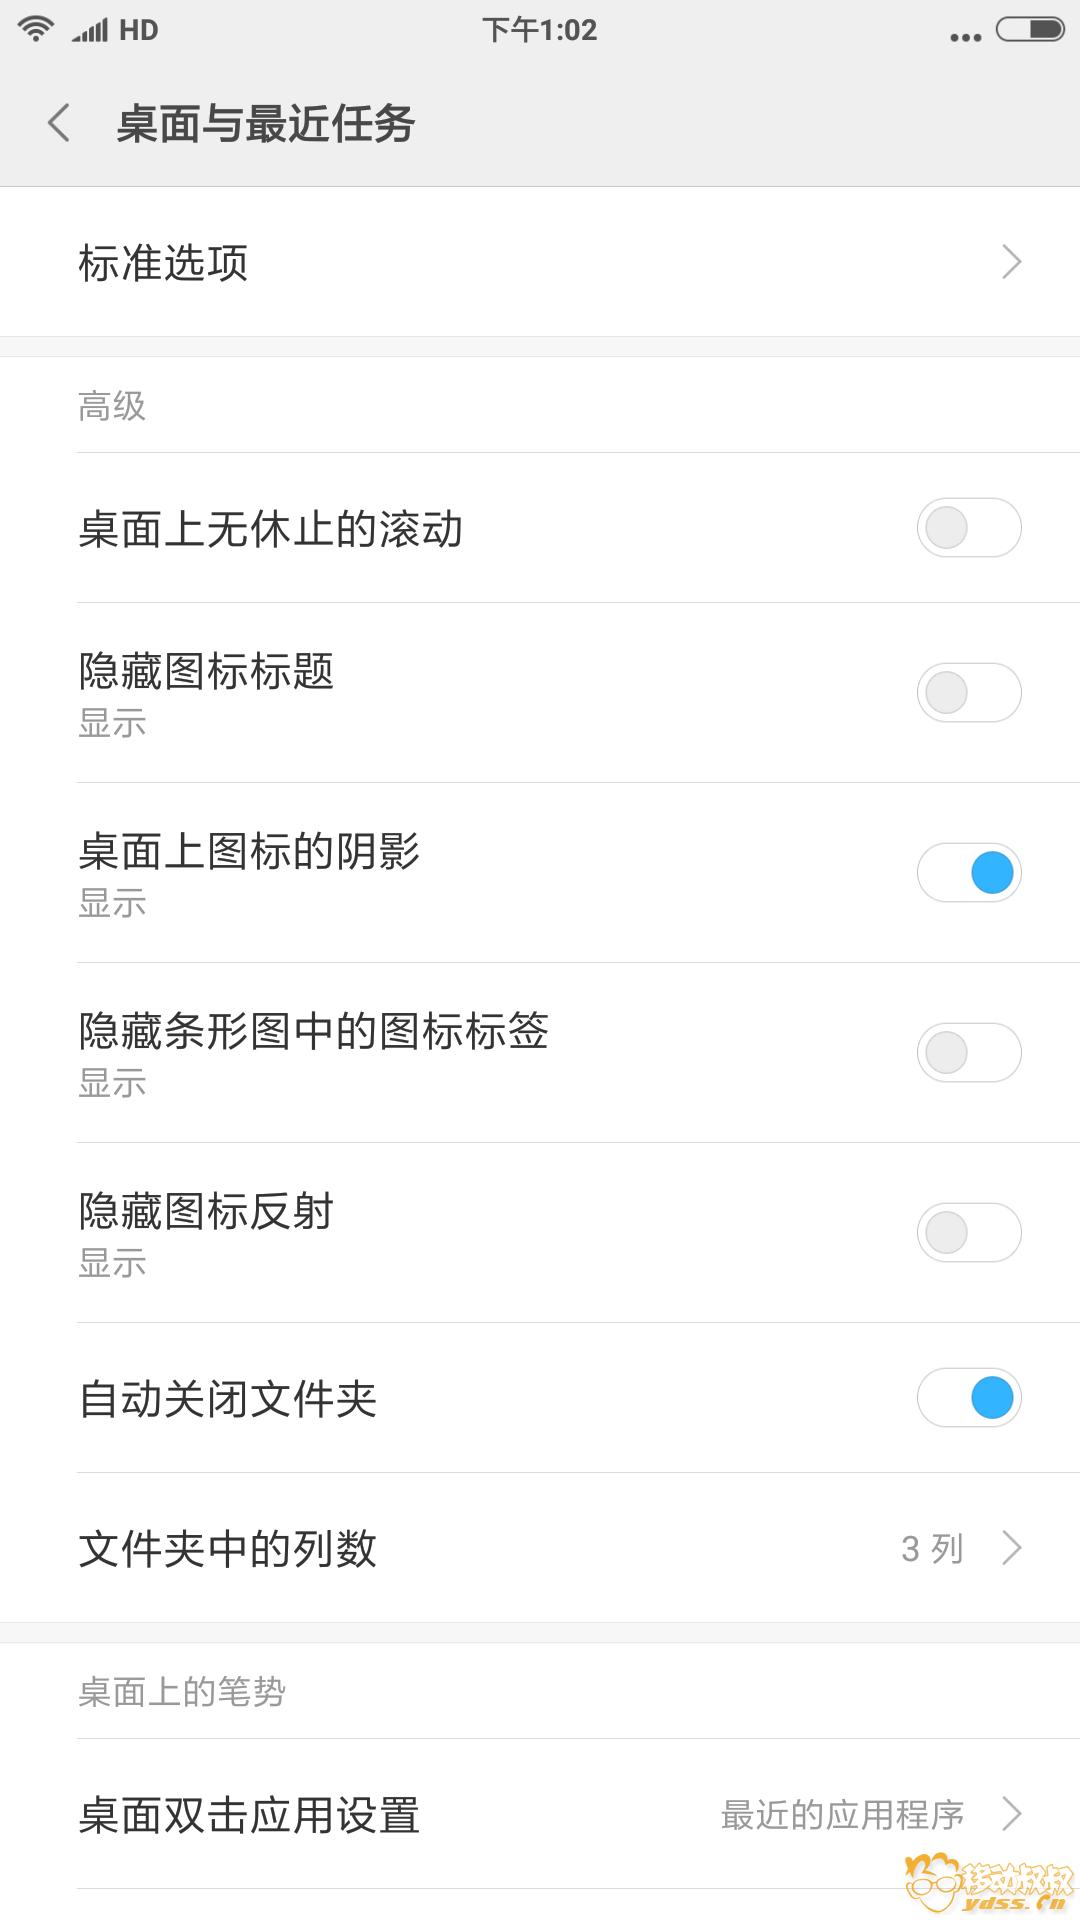 Screenshot_2018-04-04-13-02-22-872_com.android.se.png